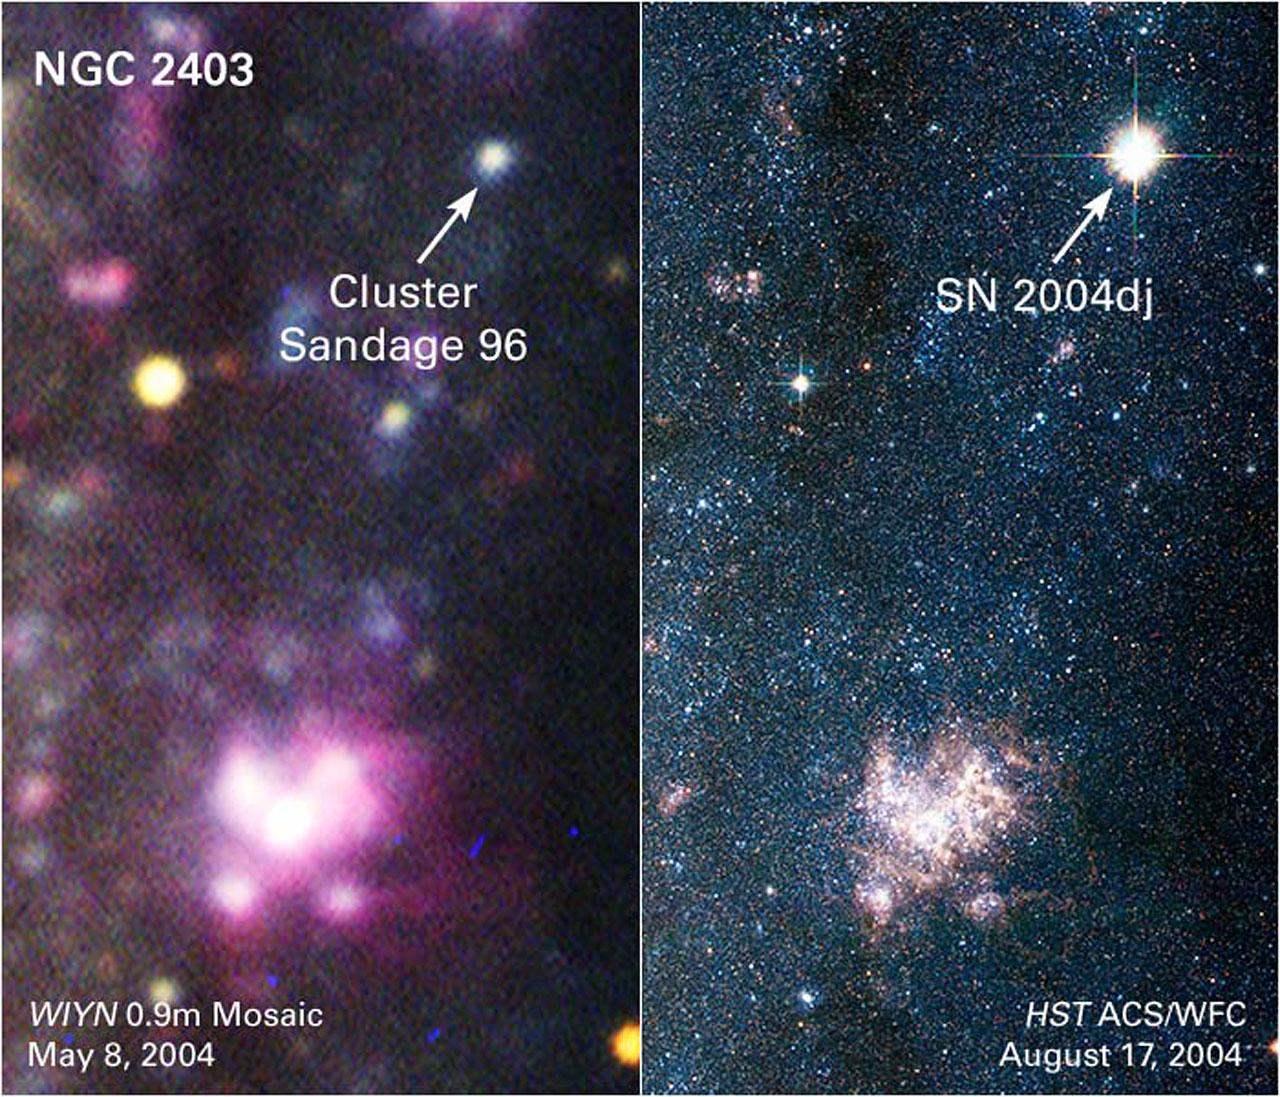 Galaxy NGC 2403: Before And After Supernova 2004dj